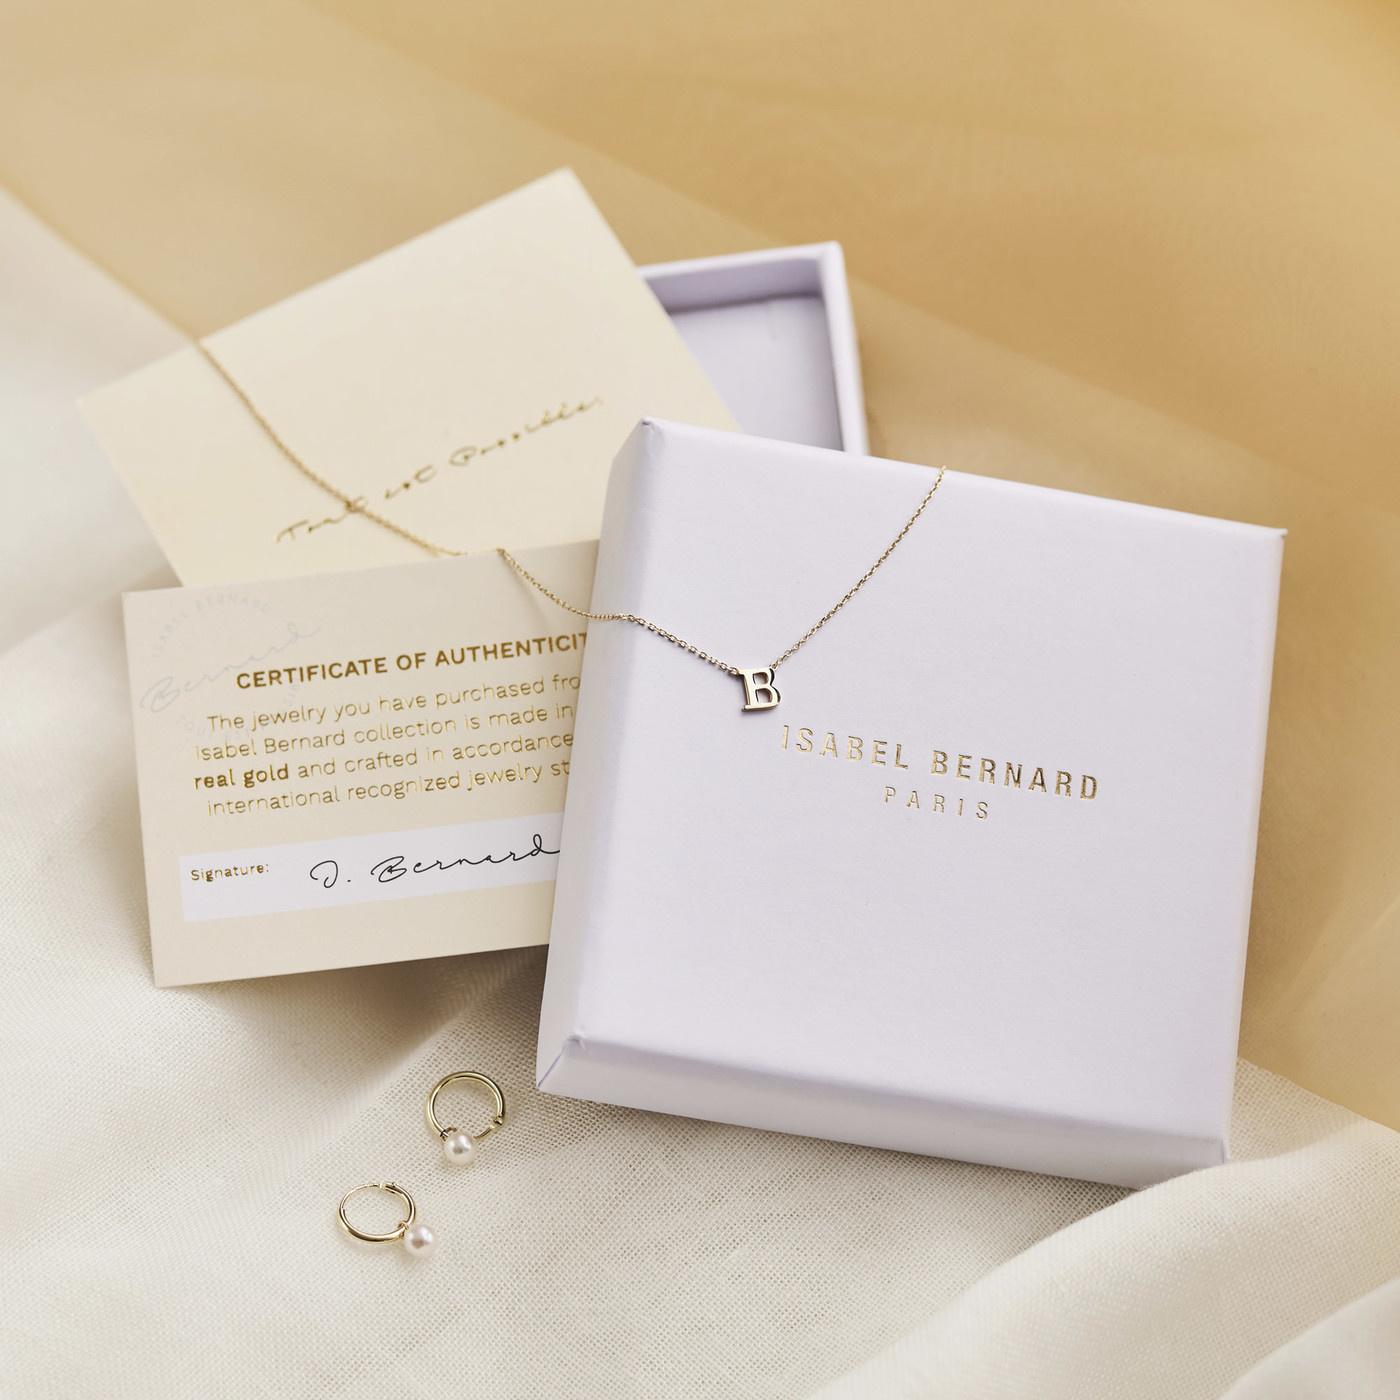 Isabel Bernard Saint Germain Tiphaine 14 karat white  gold hoop earrings with zirkonia